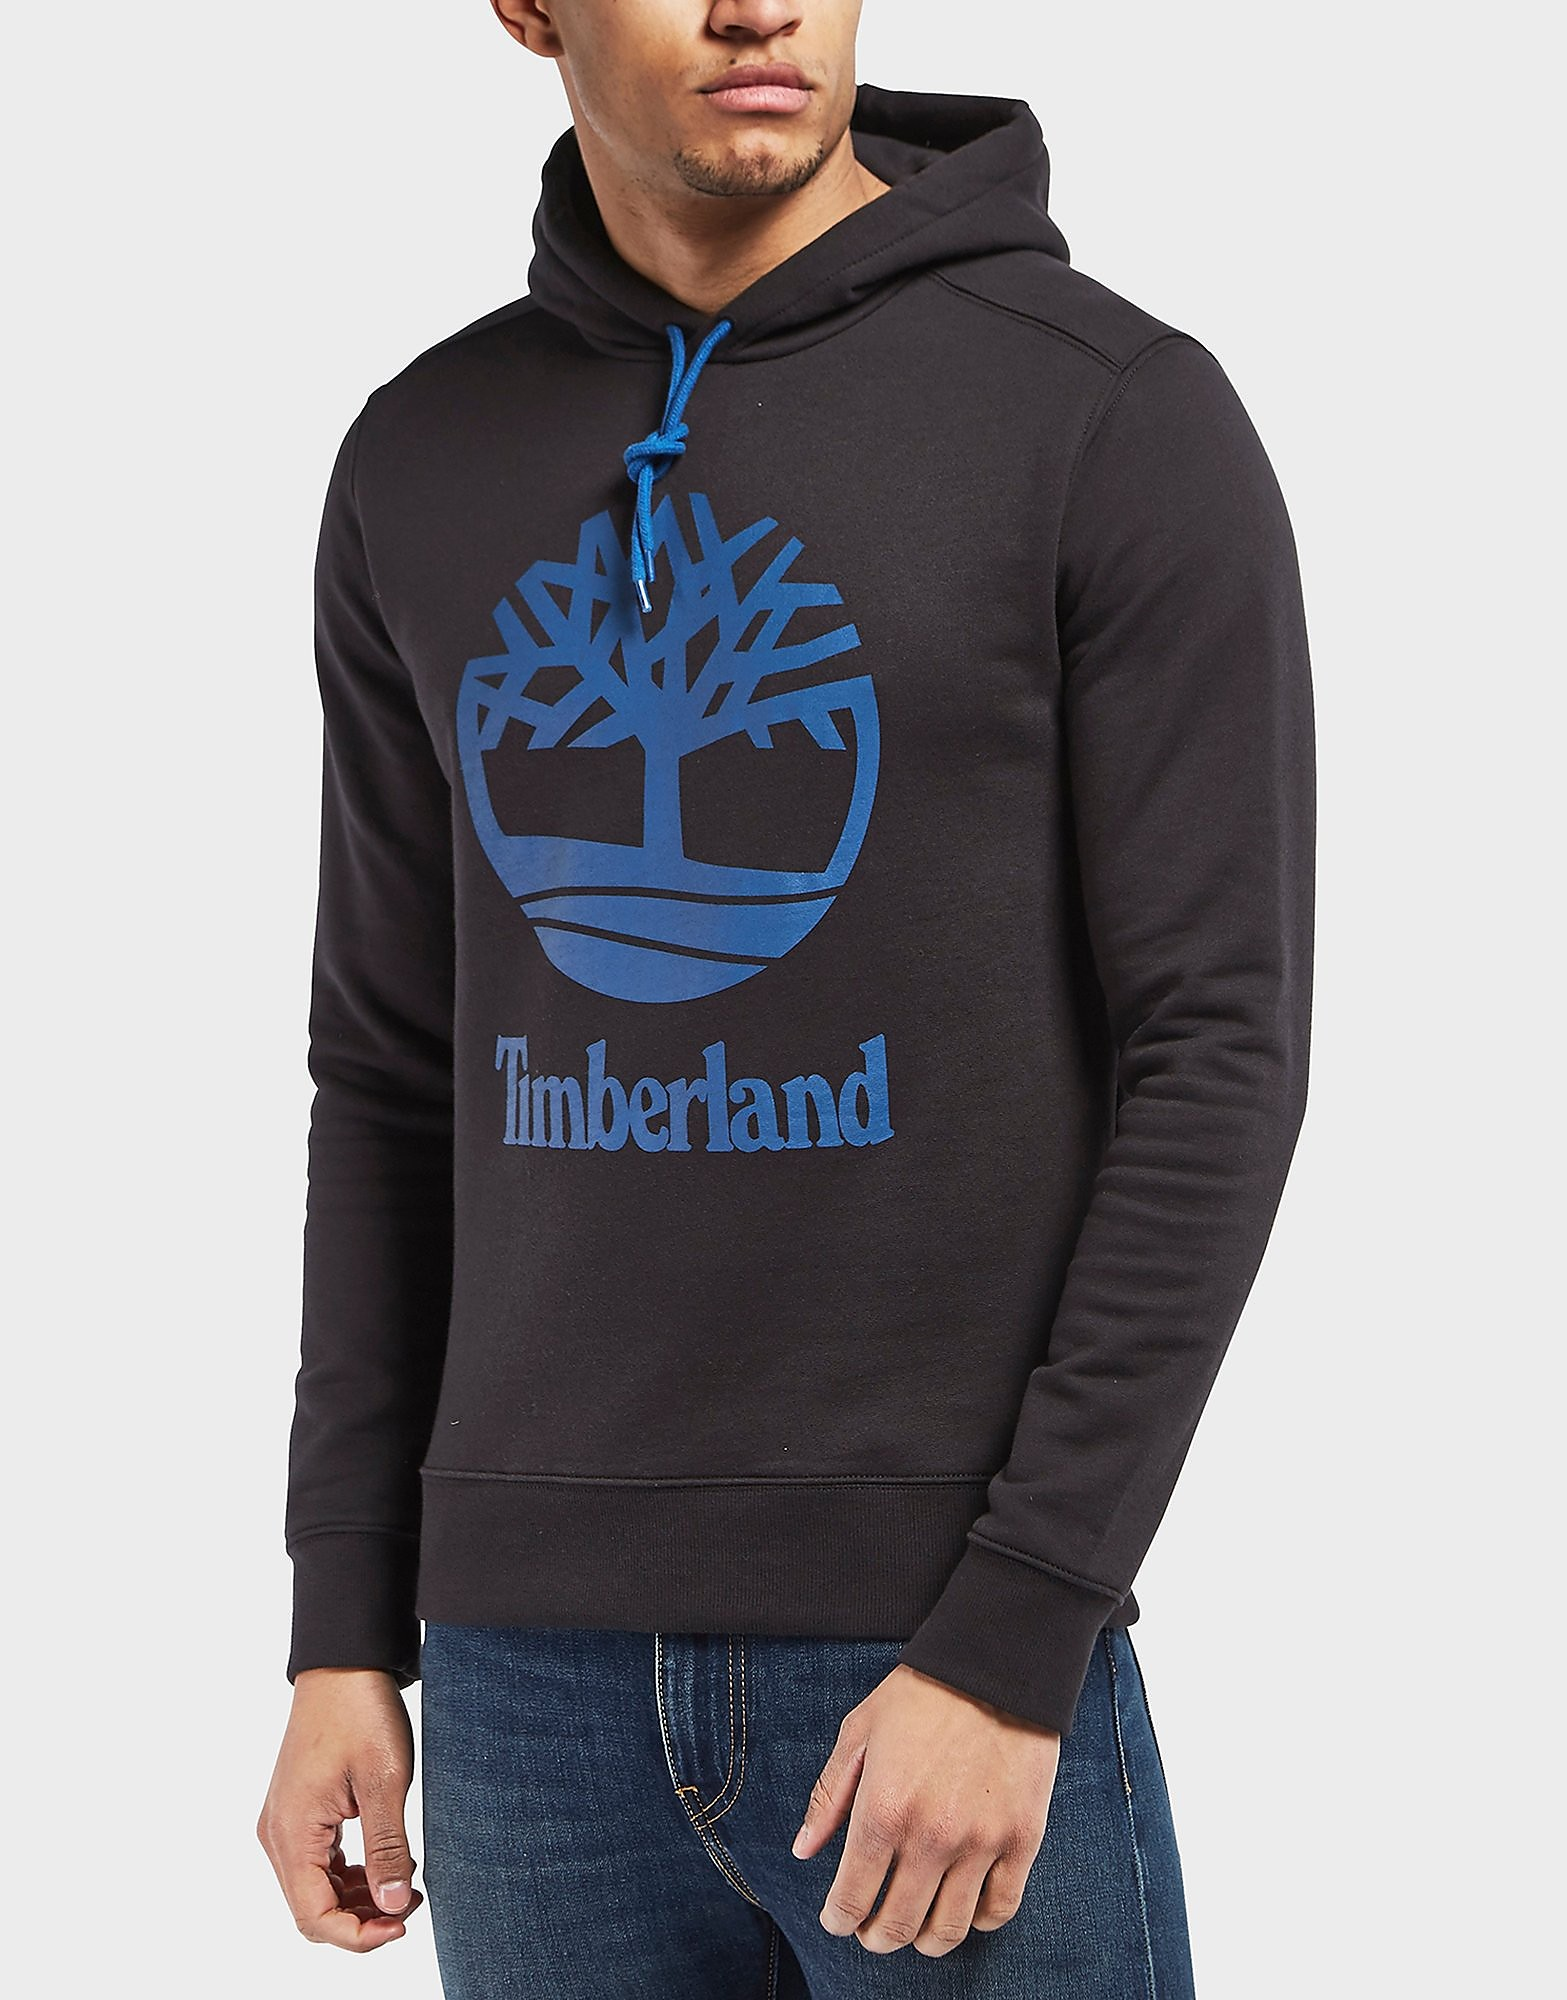 Timberland Overhead Stack Hoodie